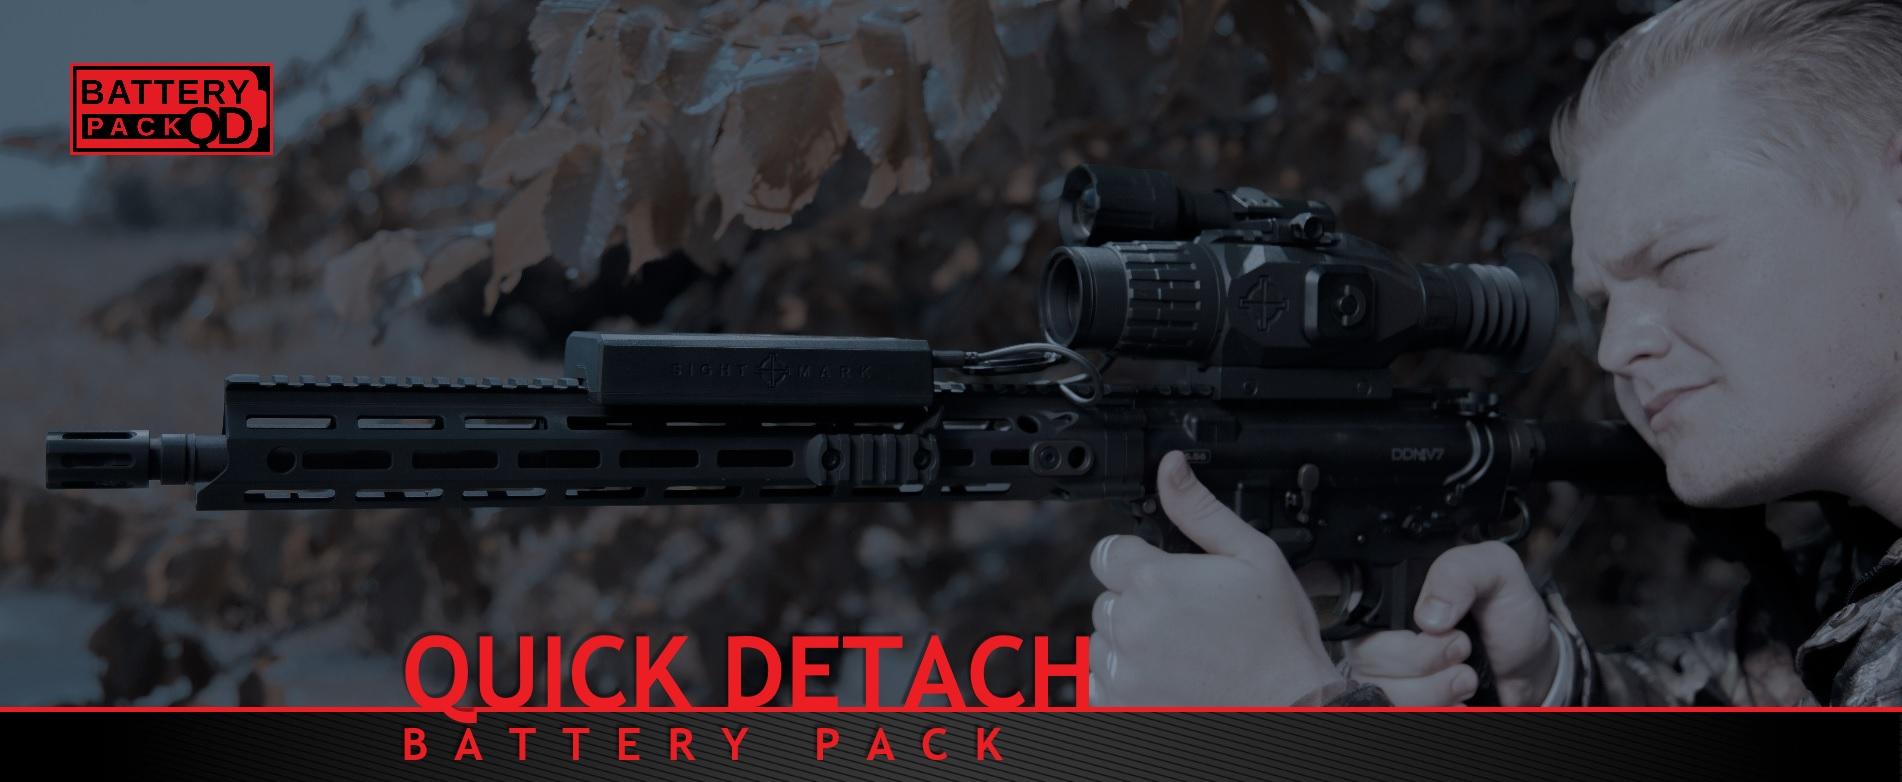 SIGHTMARK-Quick-Detach-Battery-Micro-USB-10-000-mAh